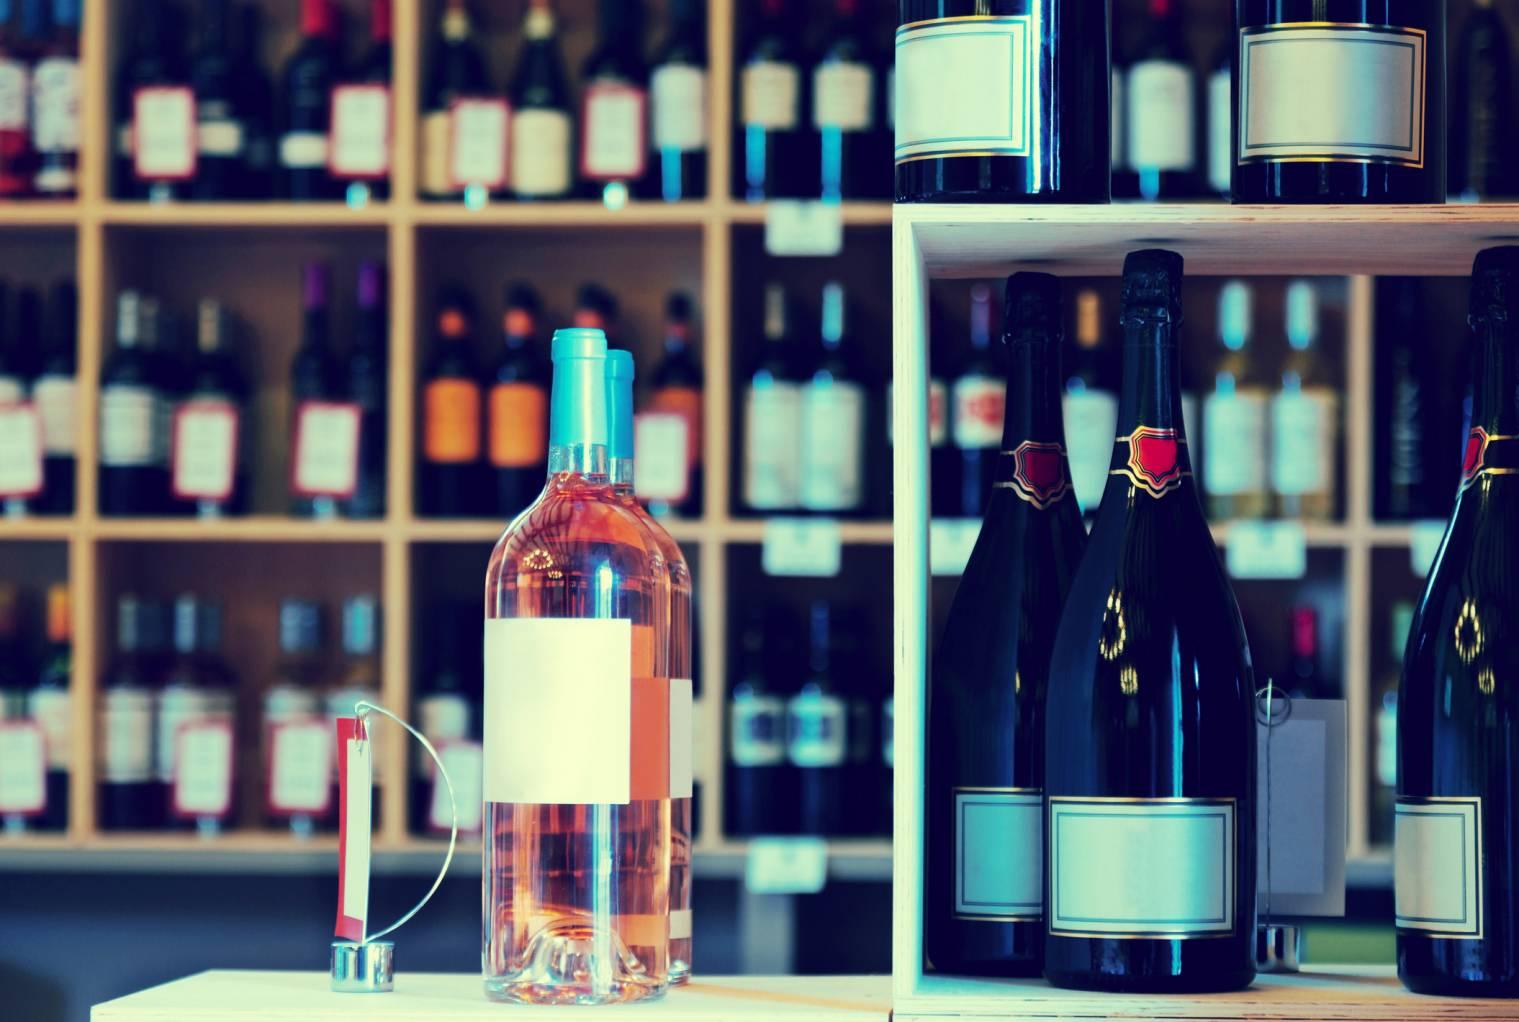 vente d'alcool